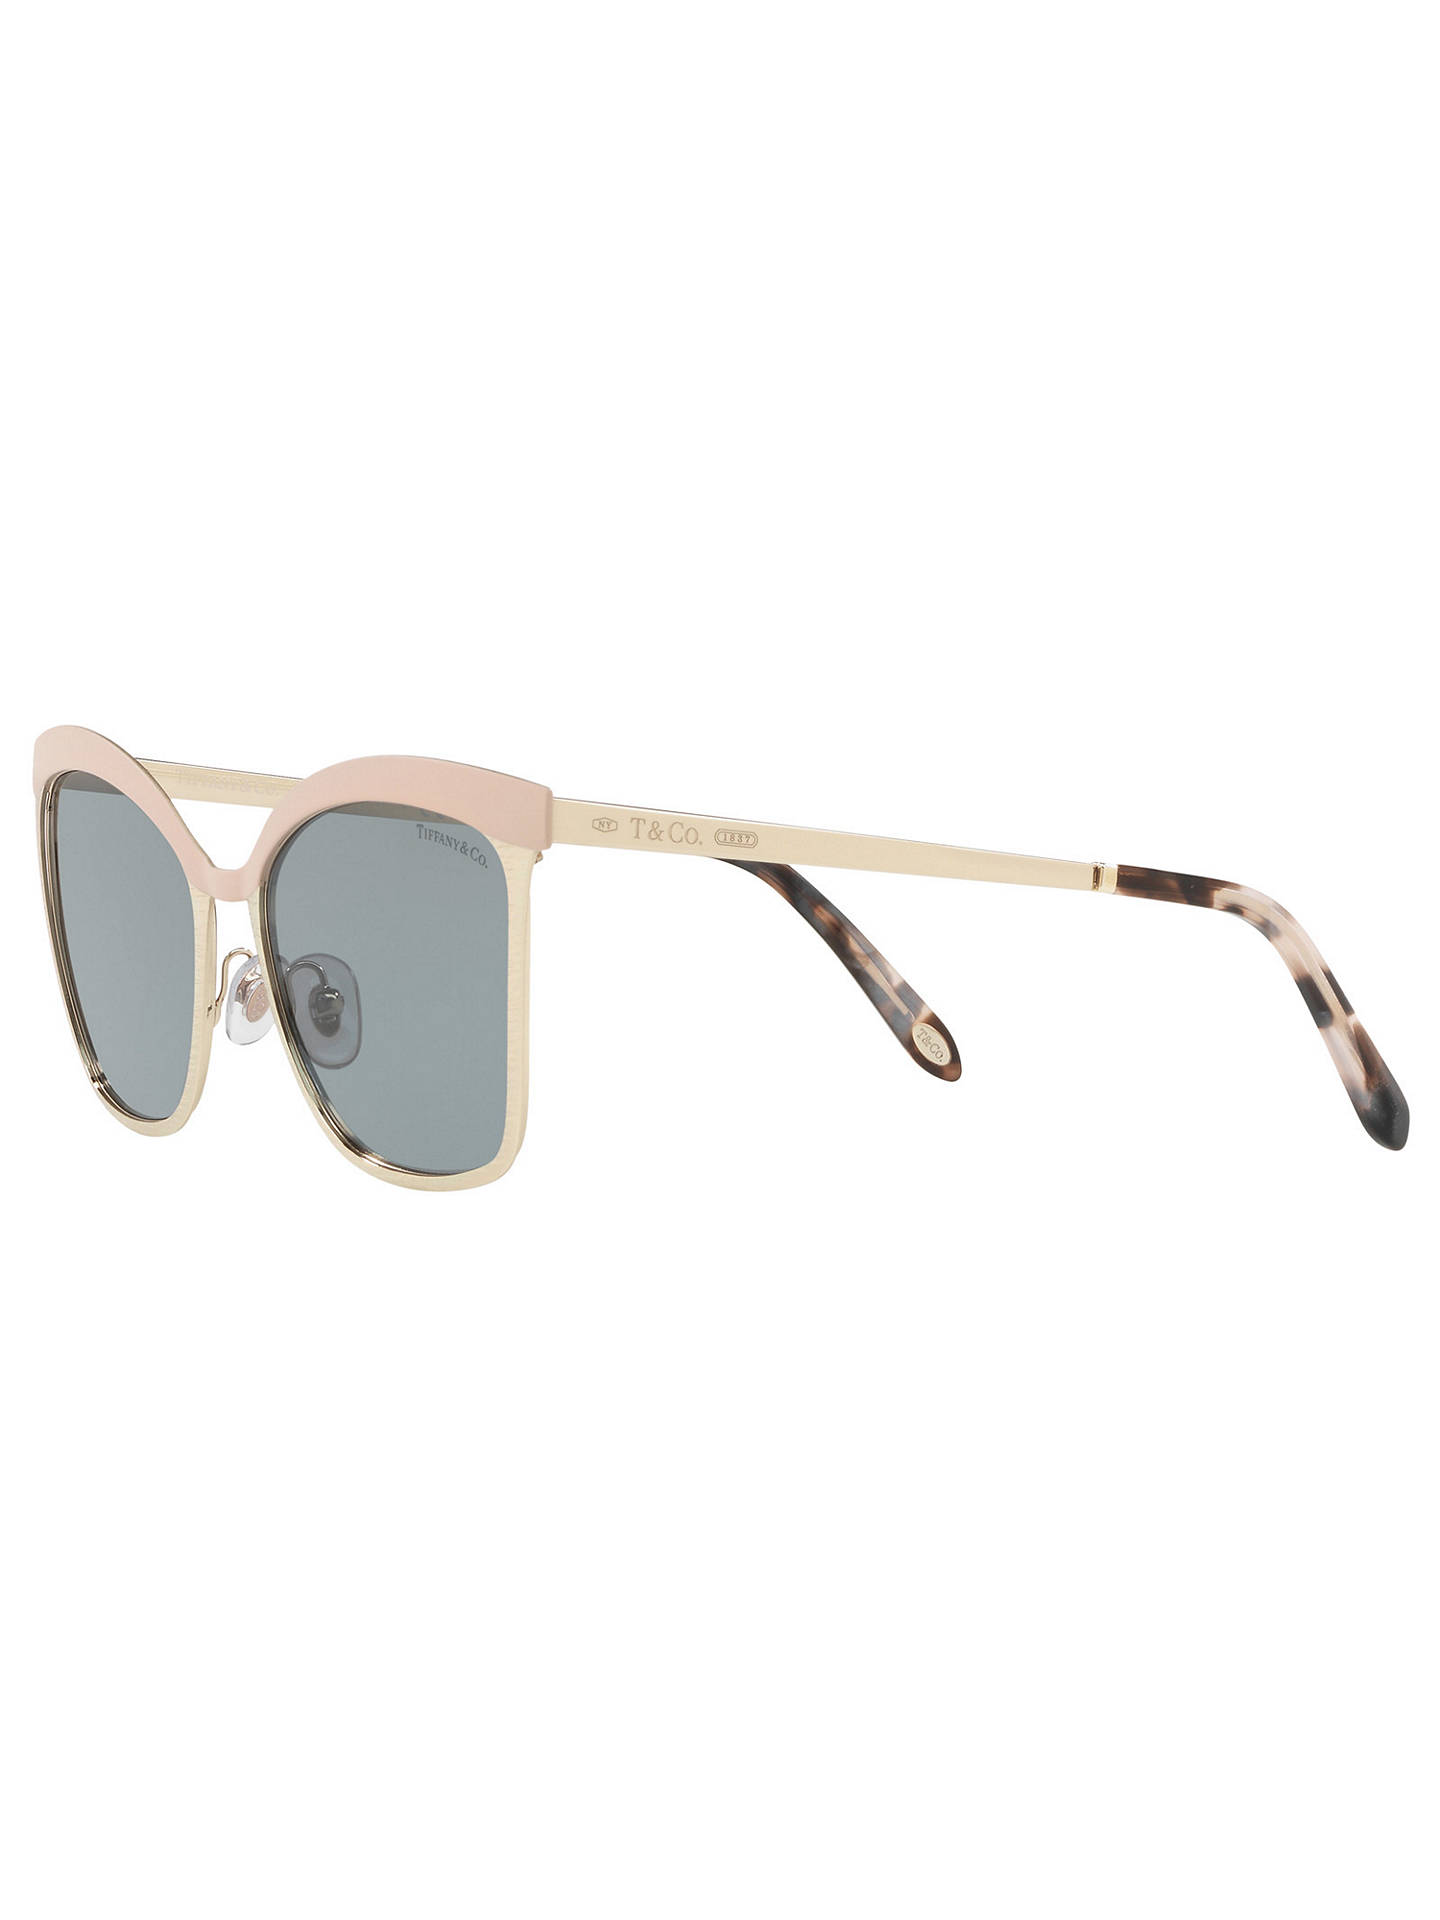 ff0549e042e6 ... Buy Tiffany & Co TF3060 Square Sunglasses, Gold/Grey Online at  johnlewis. ...